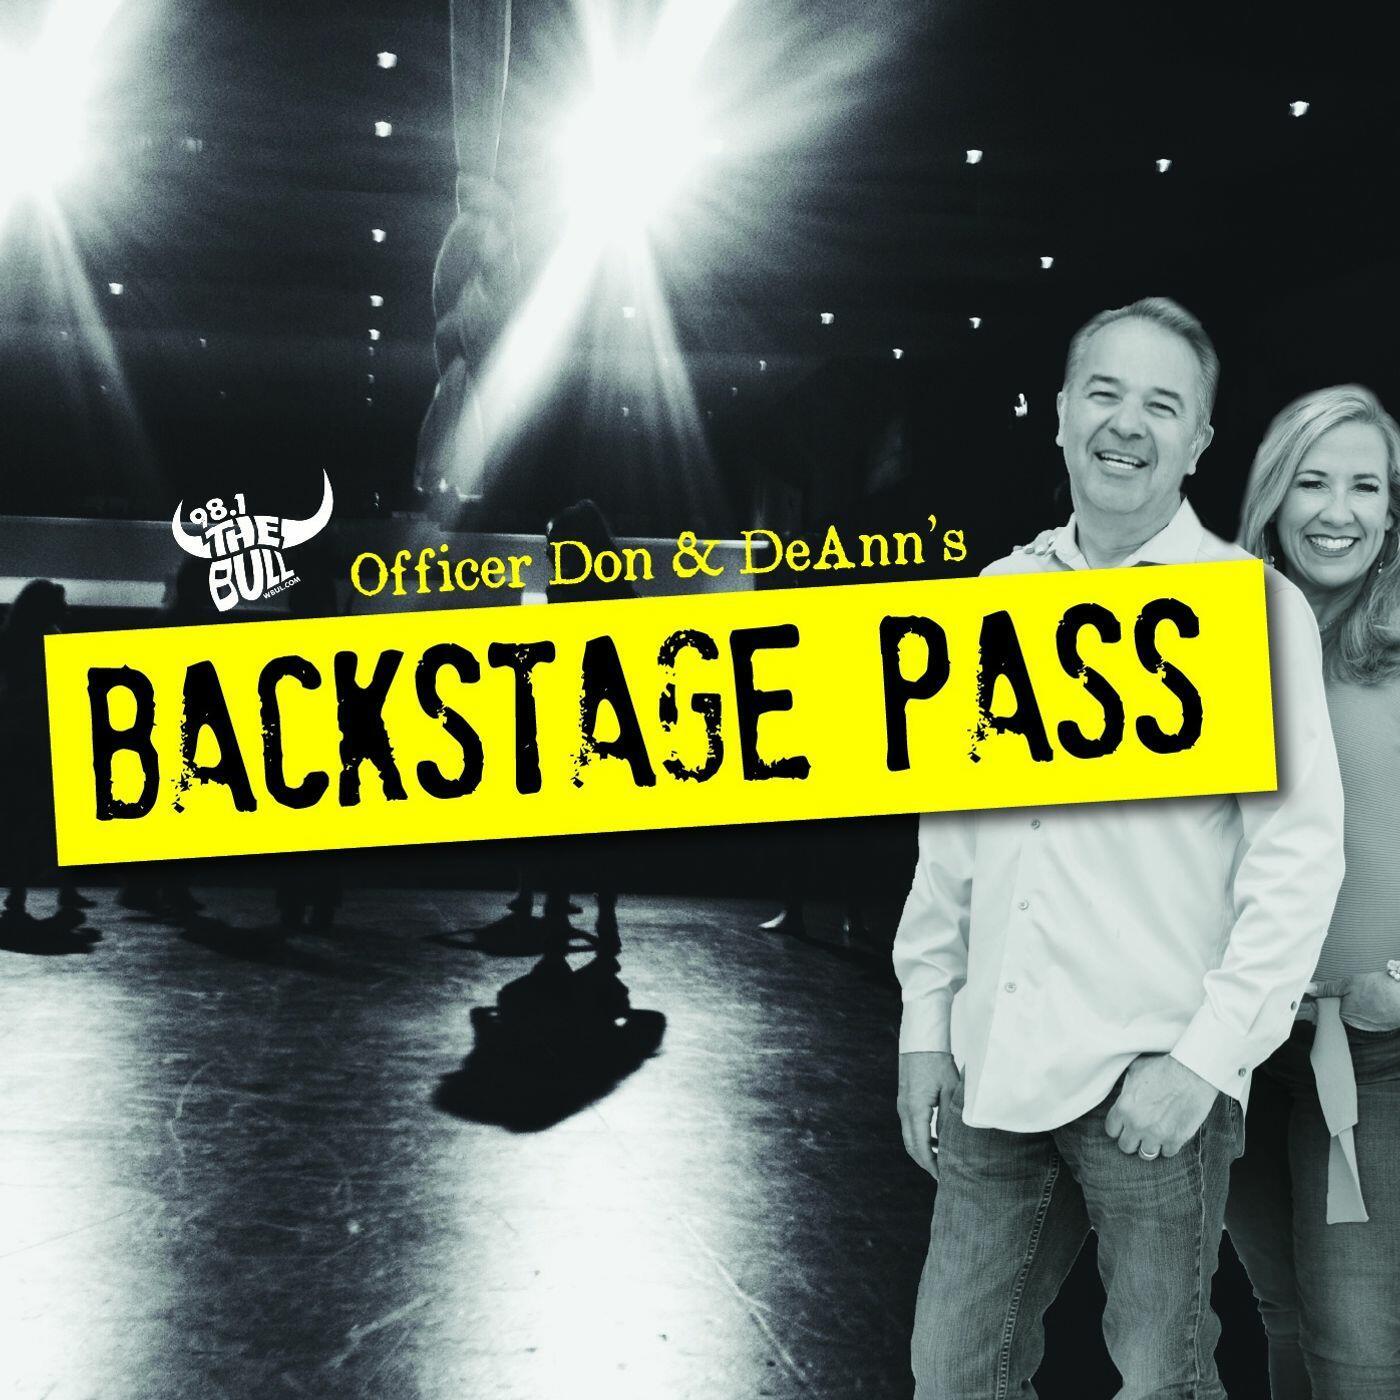 Officer Don & DeAnn's Backstage Pass